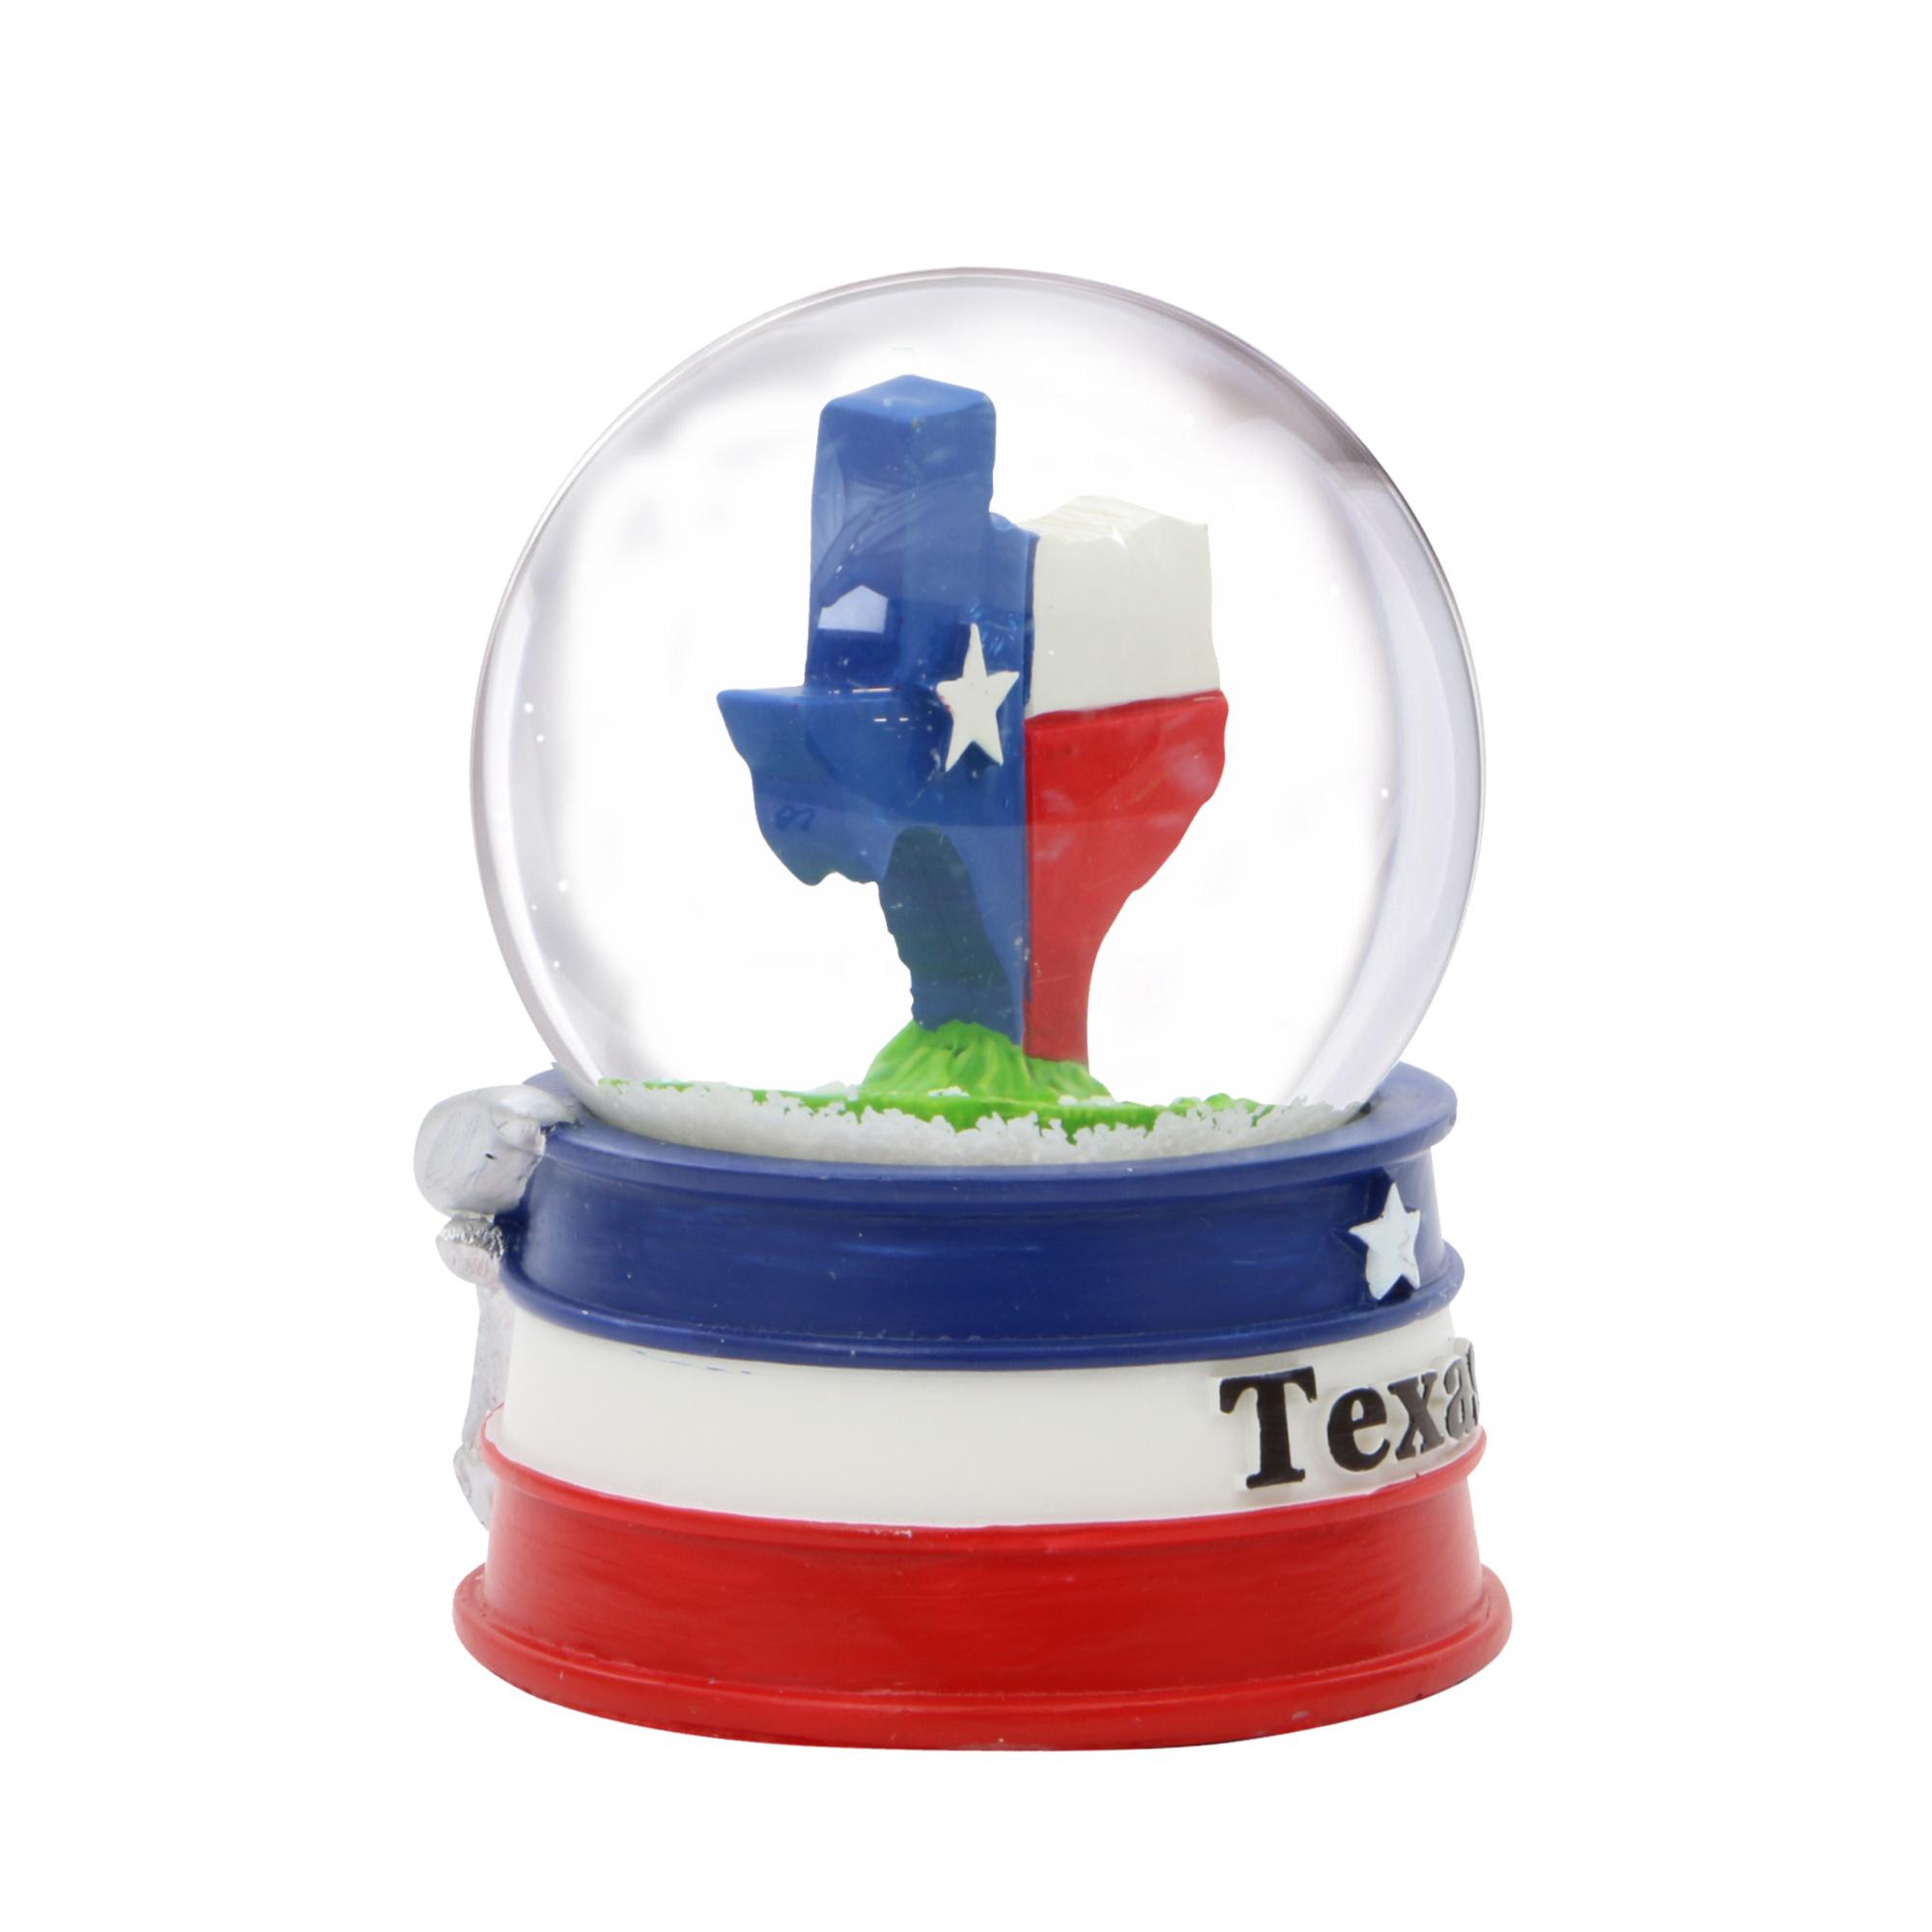 Dallas Texas Snow Globe 3.5 Inches Tall